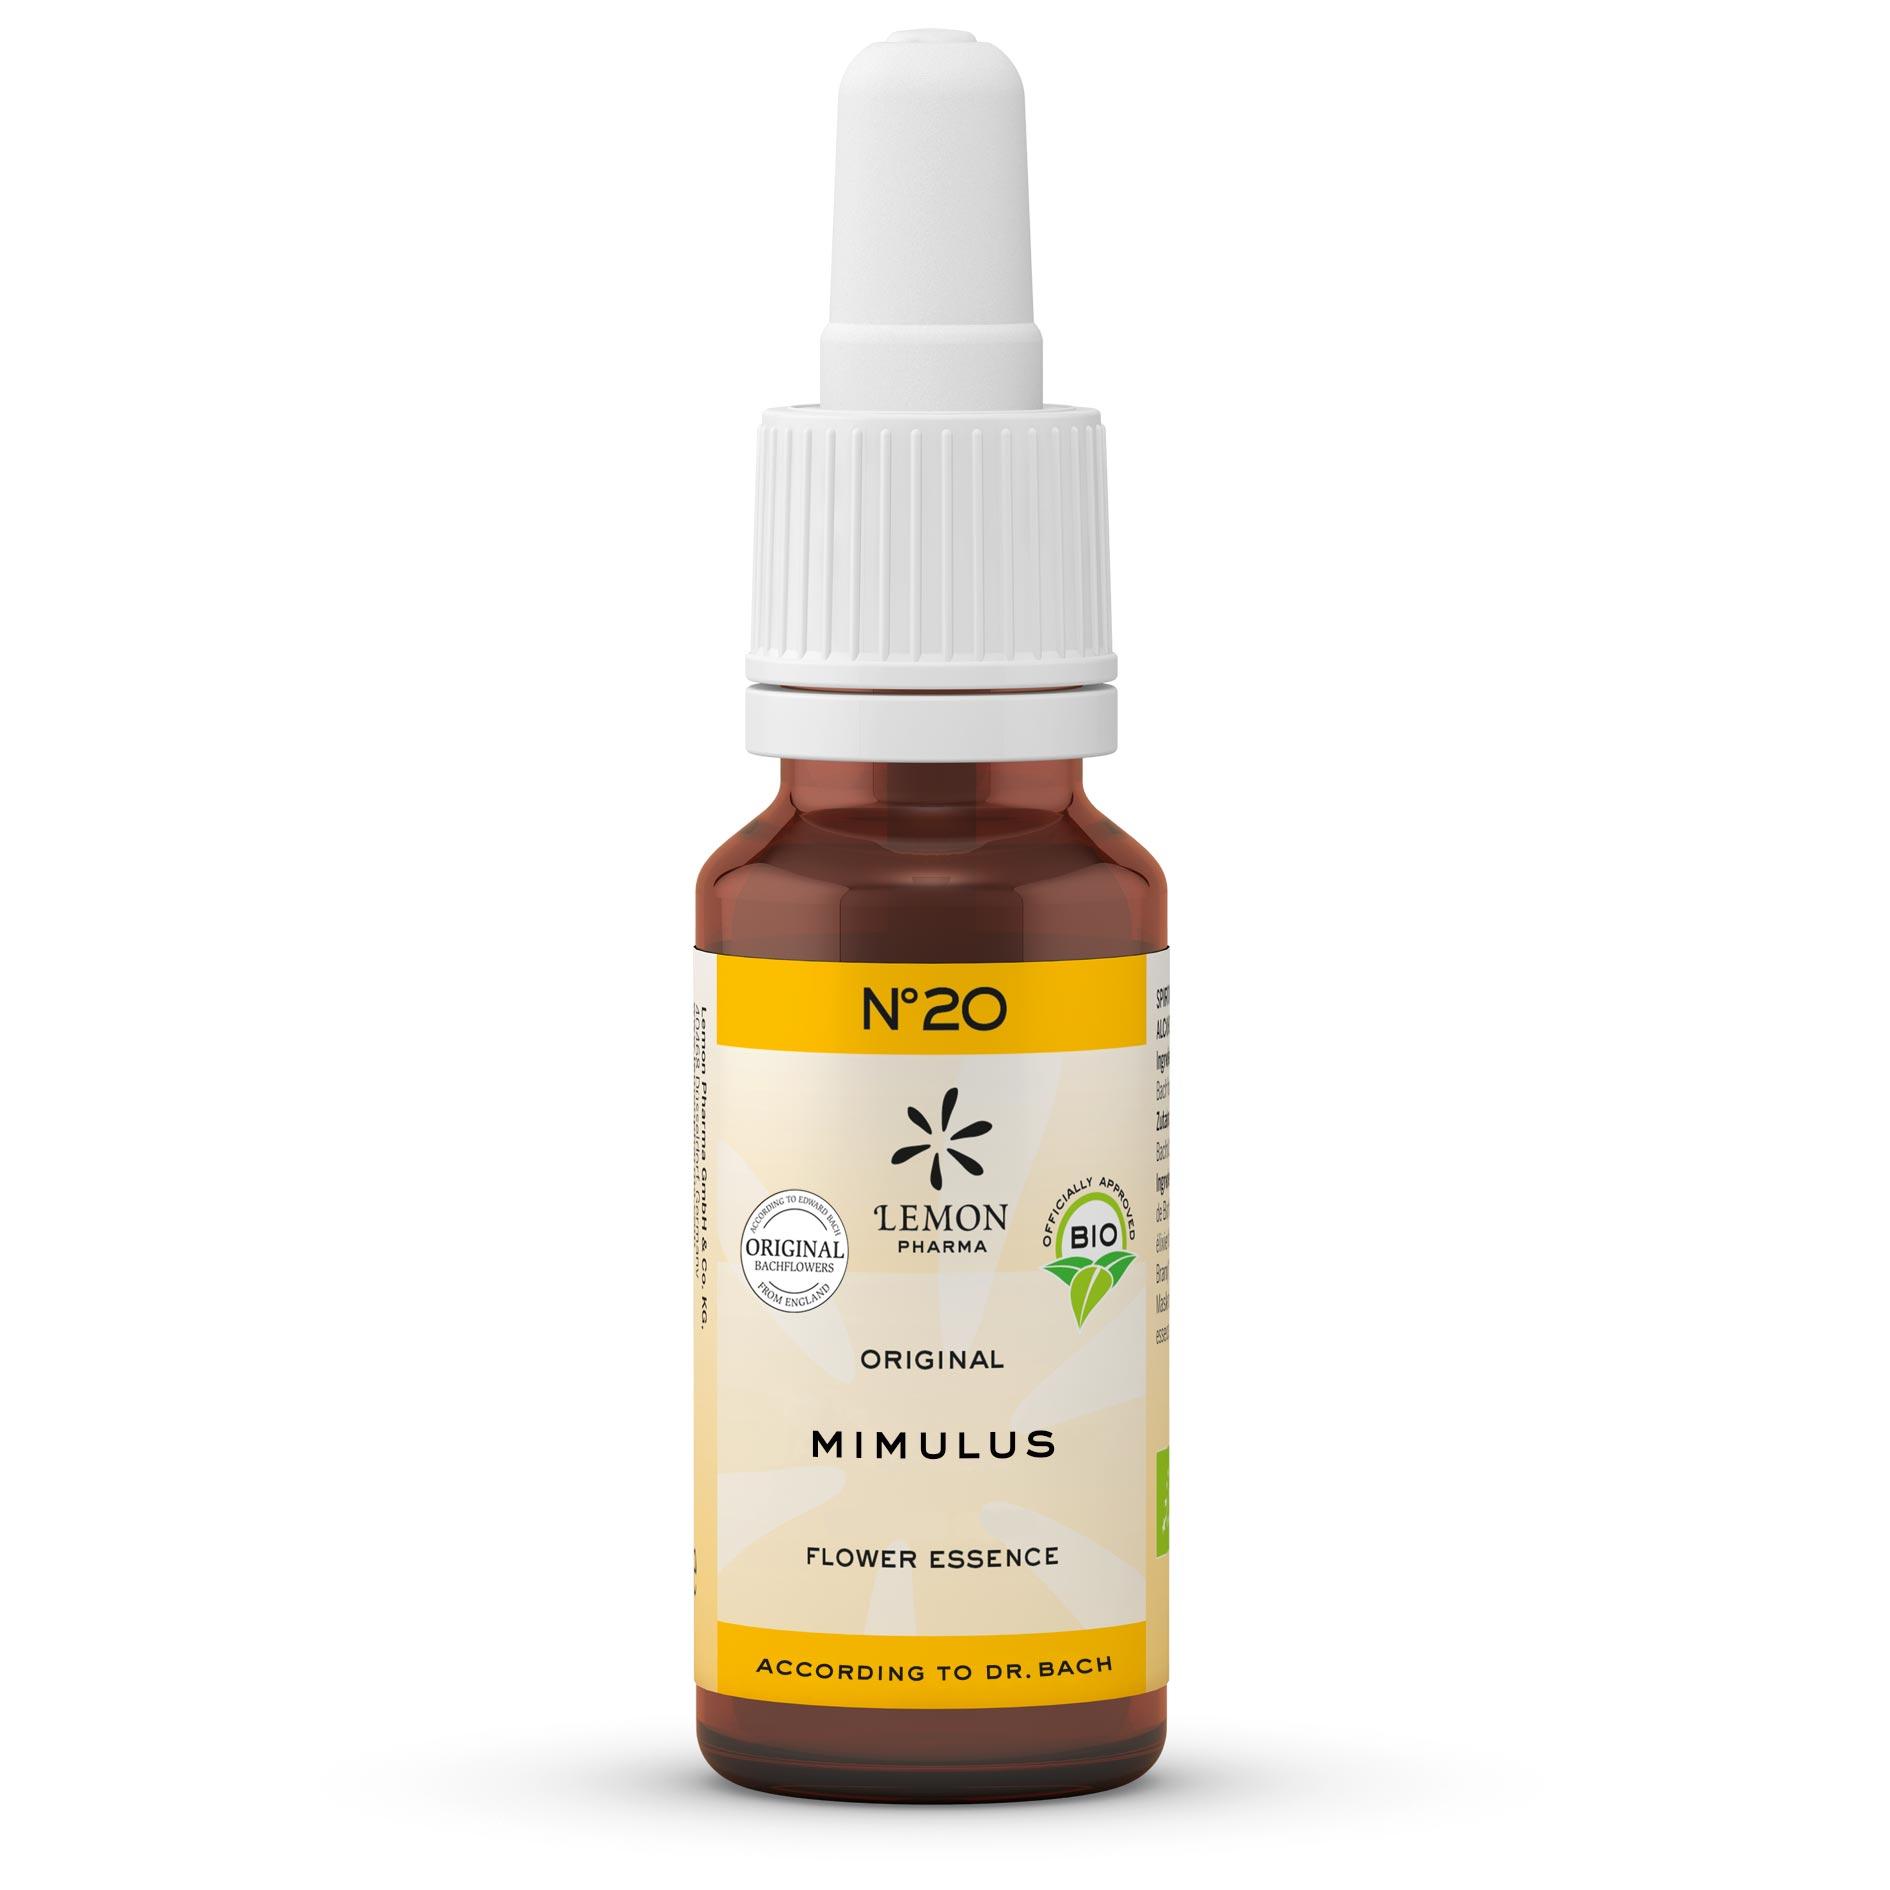 Lemon Pharma Original Bachblüten Tropfen Nr 20 Mimulus Gefleckte Gauklerblume Tapferkeit